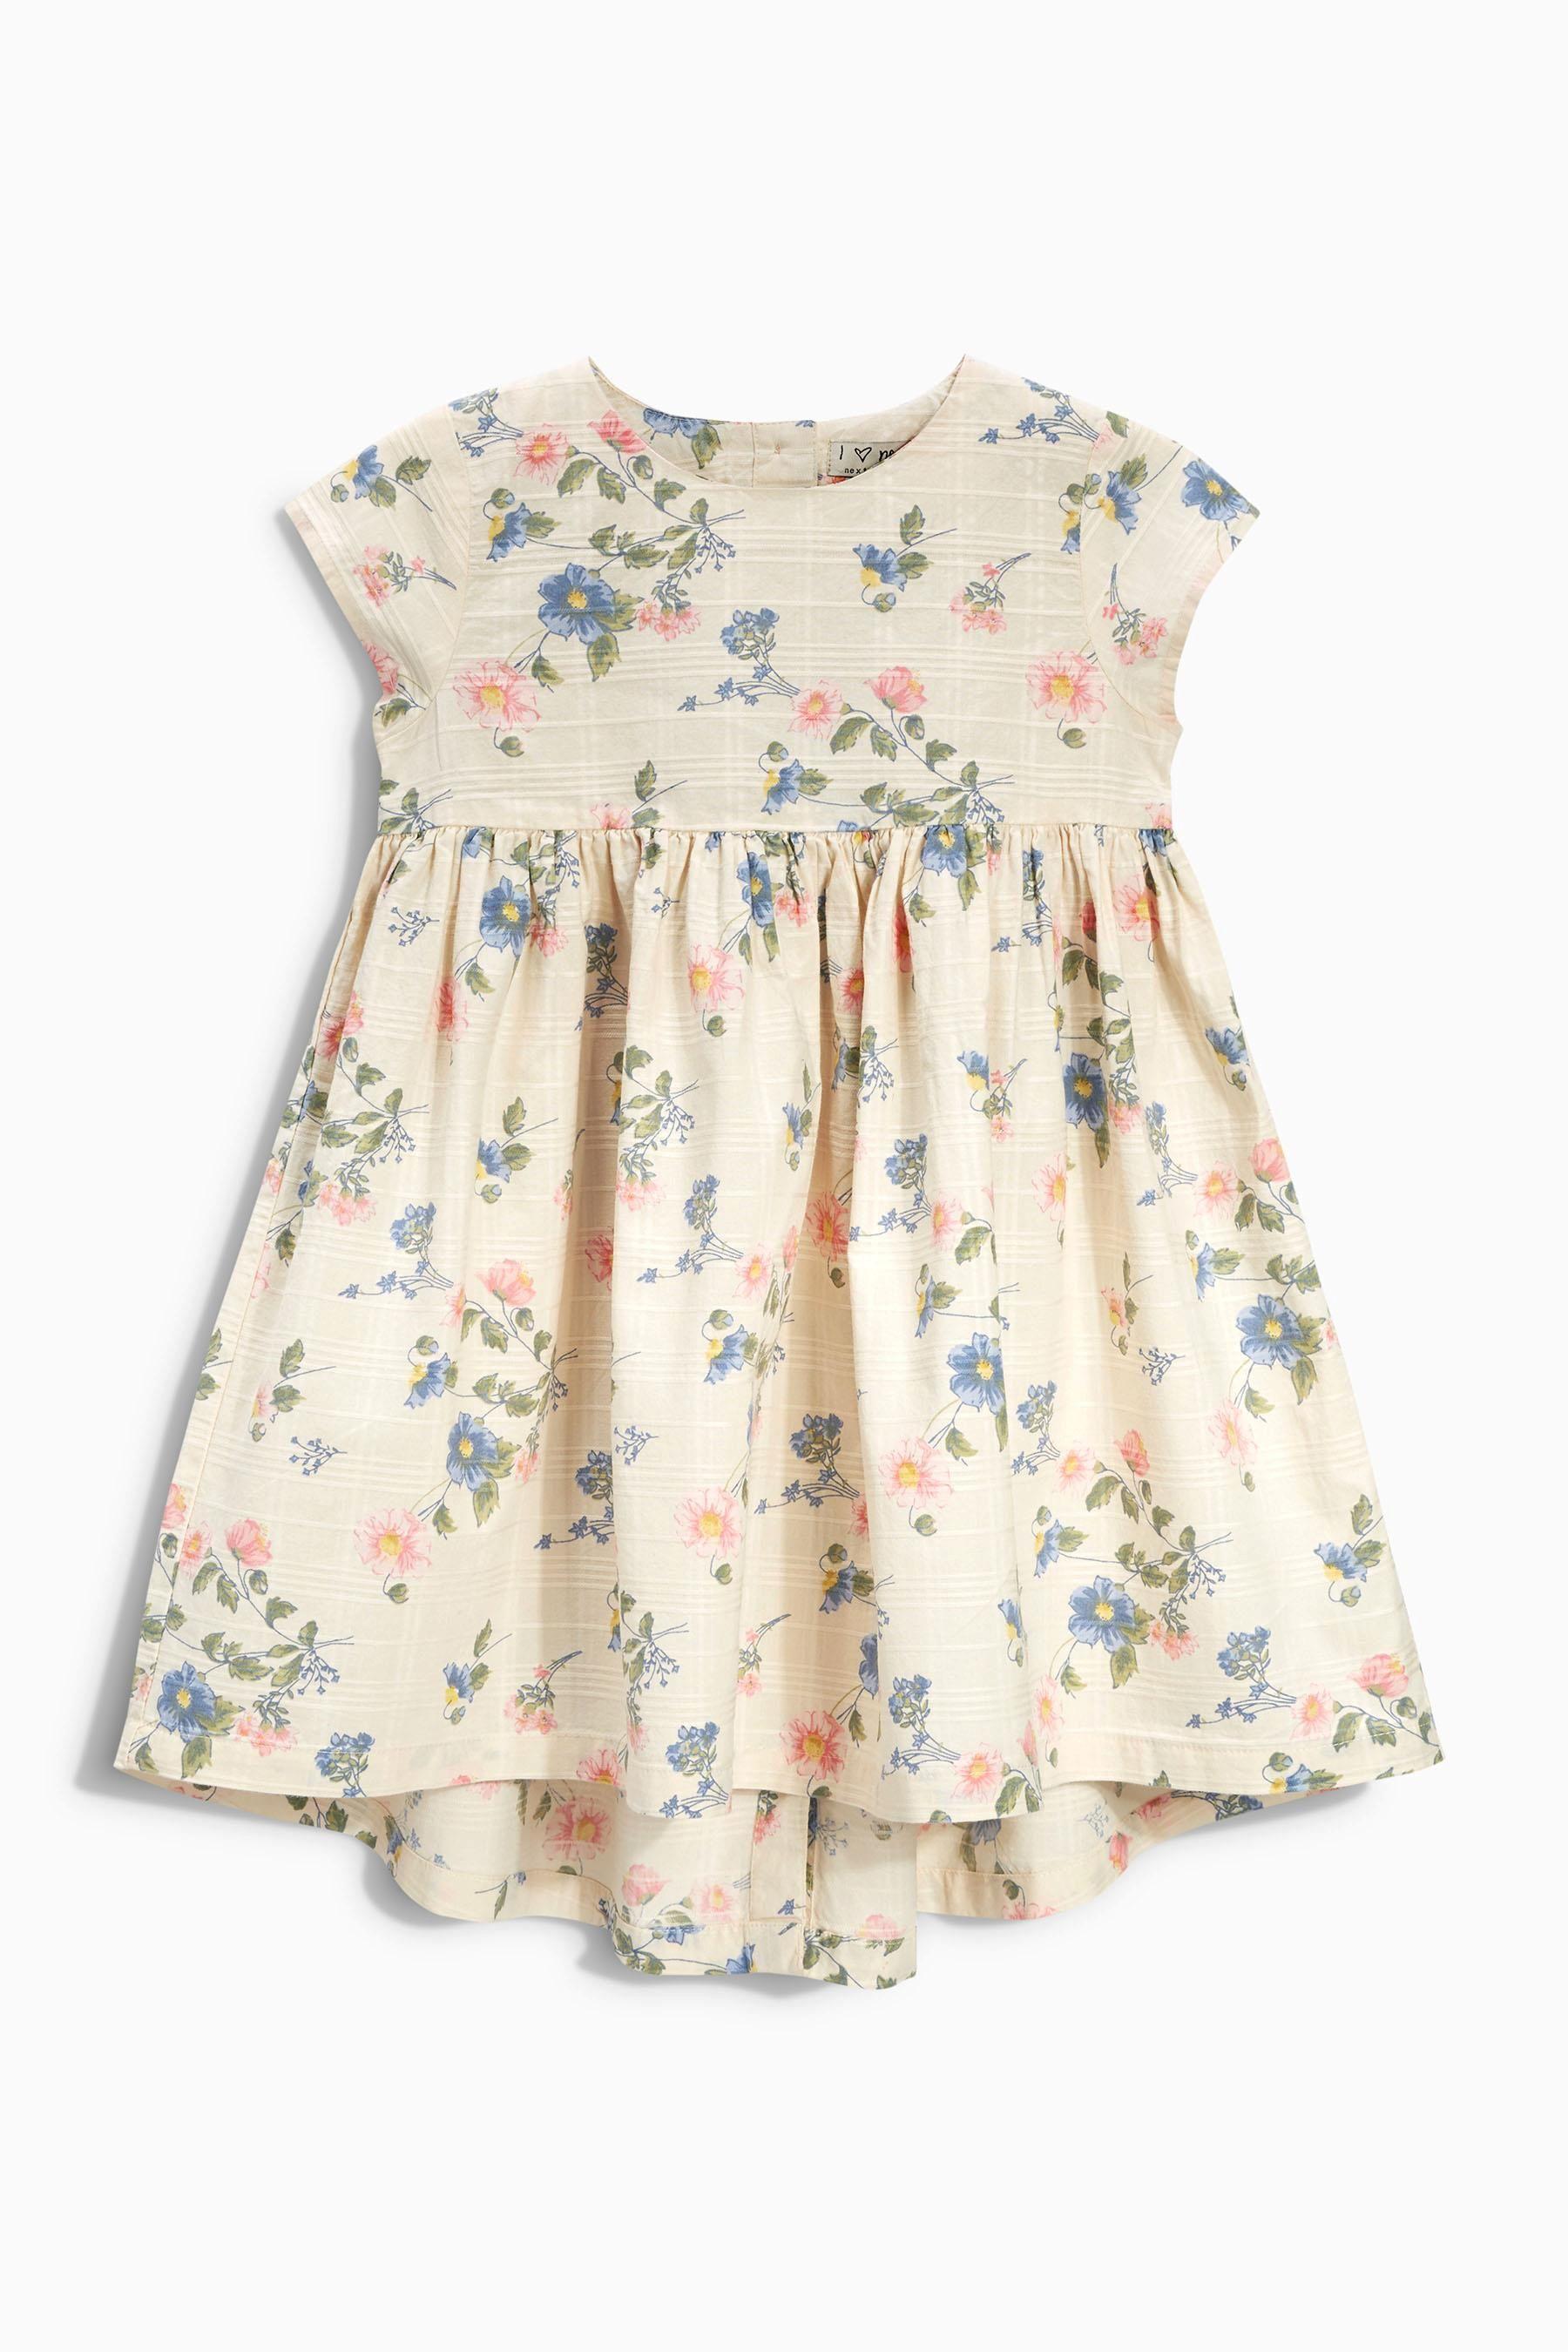 Pin by shagun sharma on kids ss dresses pinterest dresses